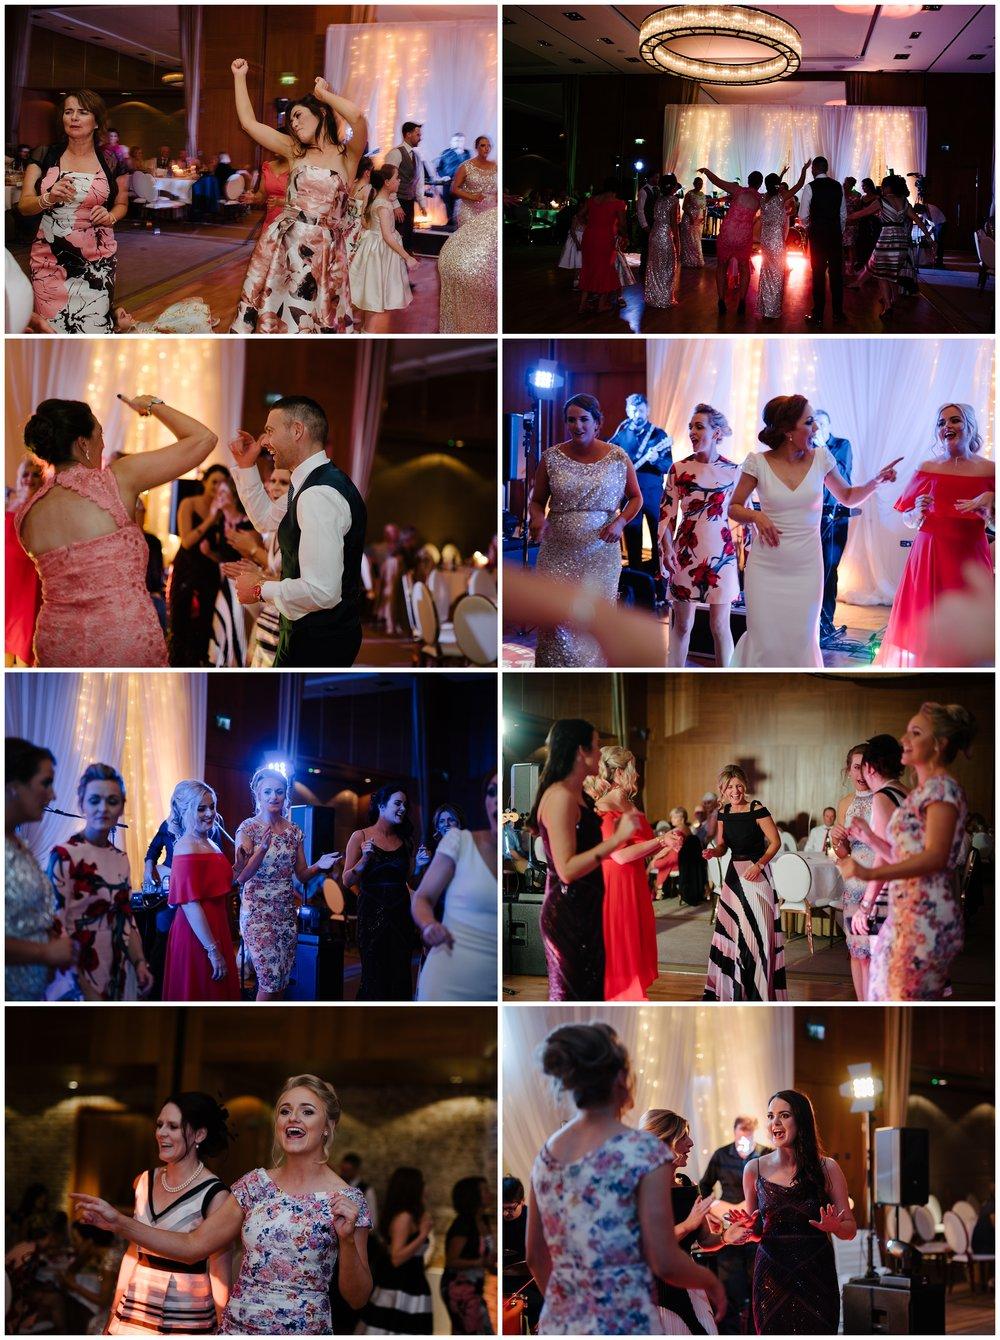 sinead_emmet_farnham_estate_wedding_jude_browne_photography_0156.jpg